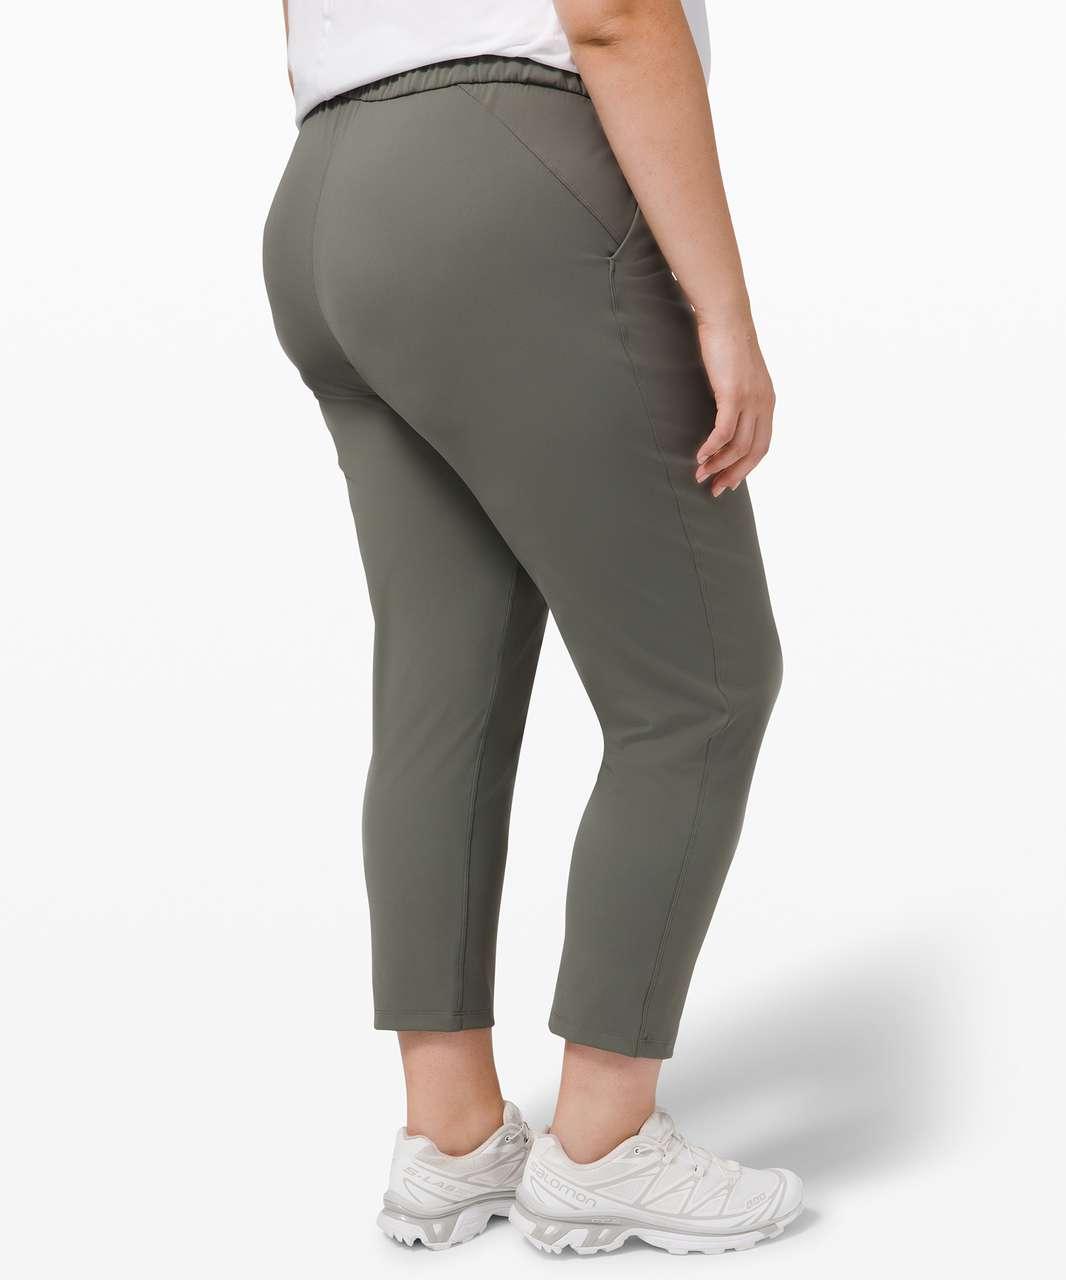 Lululemon Keep Moving Pant 7/8 High-Rise - Grey Sage